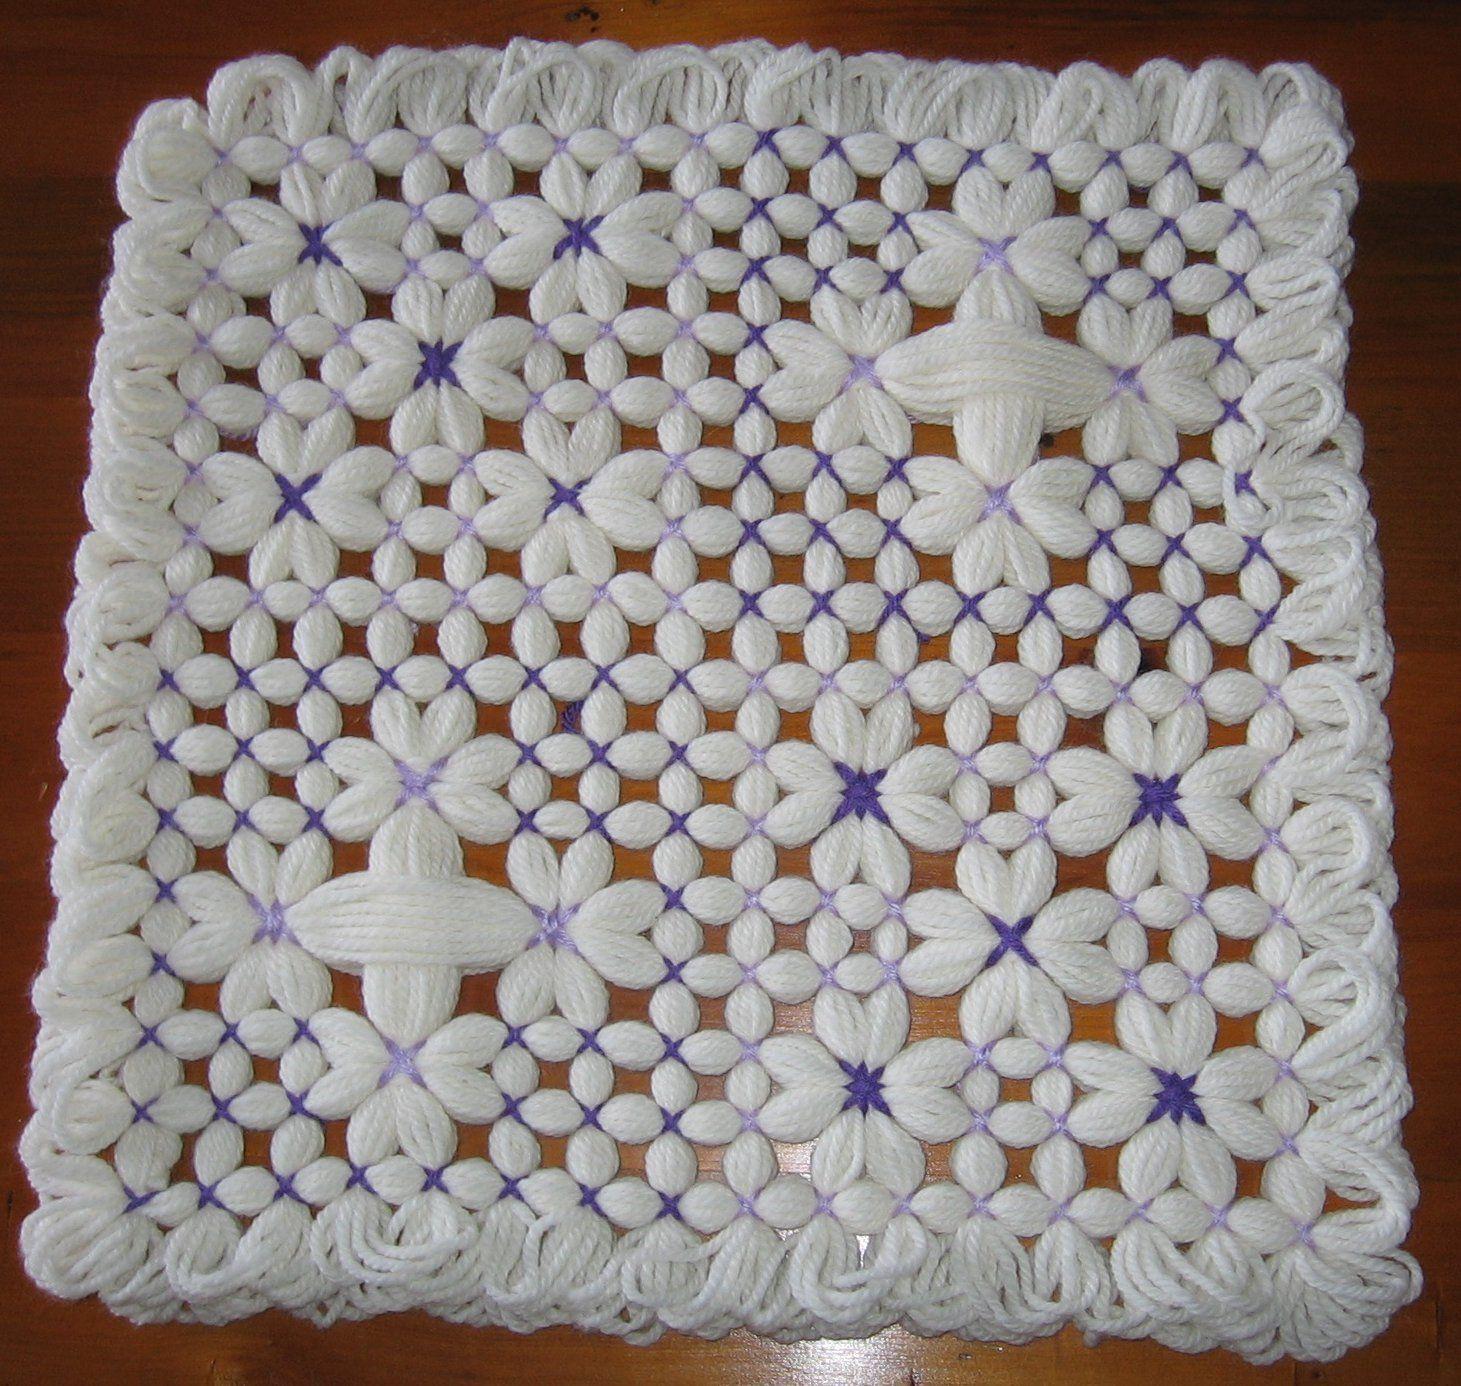 Knitting Loom Pom Pom Maker : The butterfly loom pompom cushion cover more idei